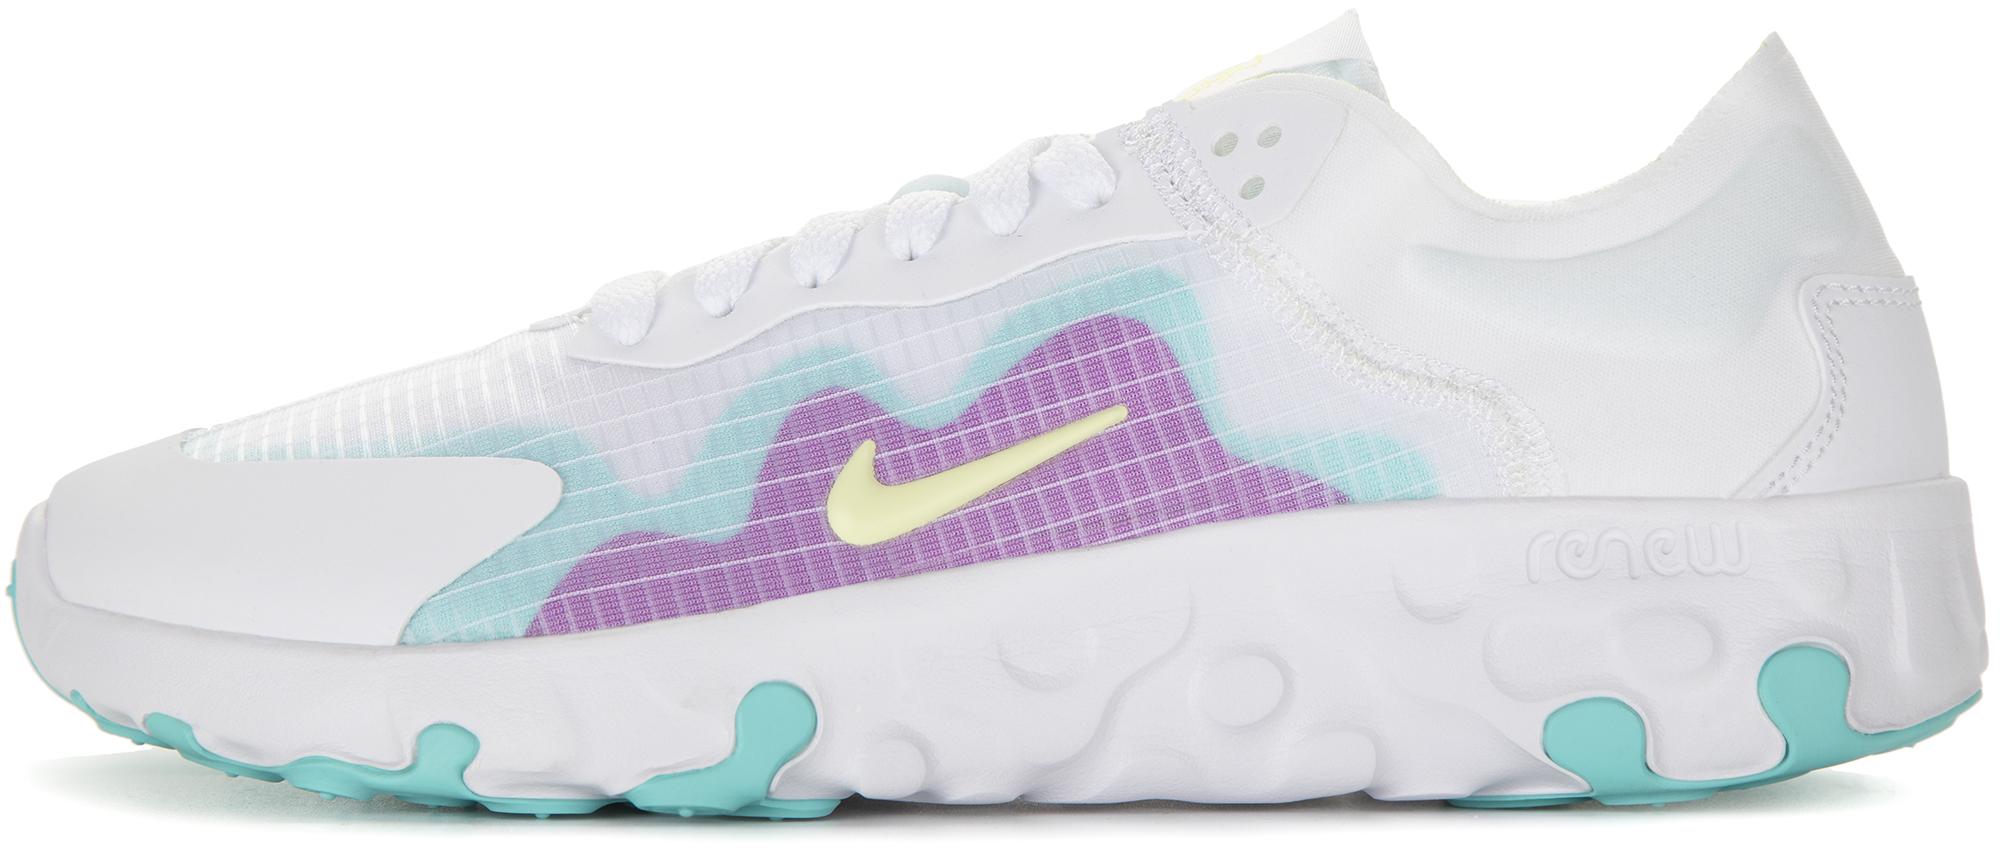 Nike Кроссовки женские Renew Lucent, размер 37,5